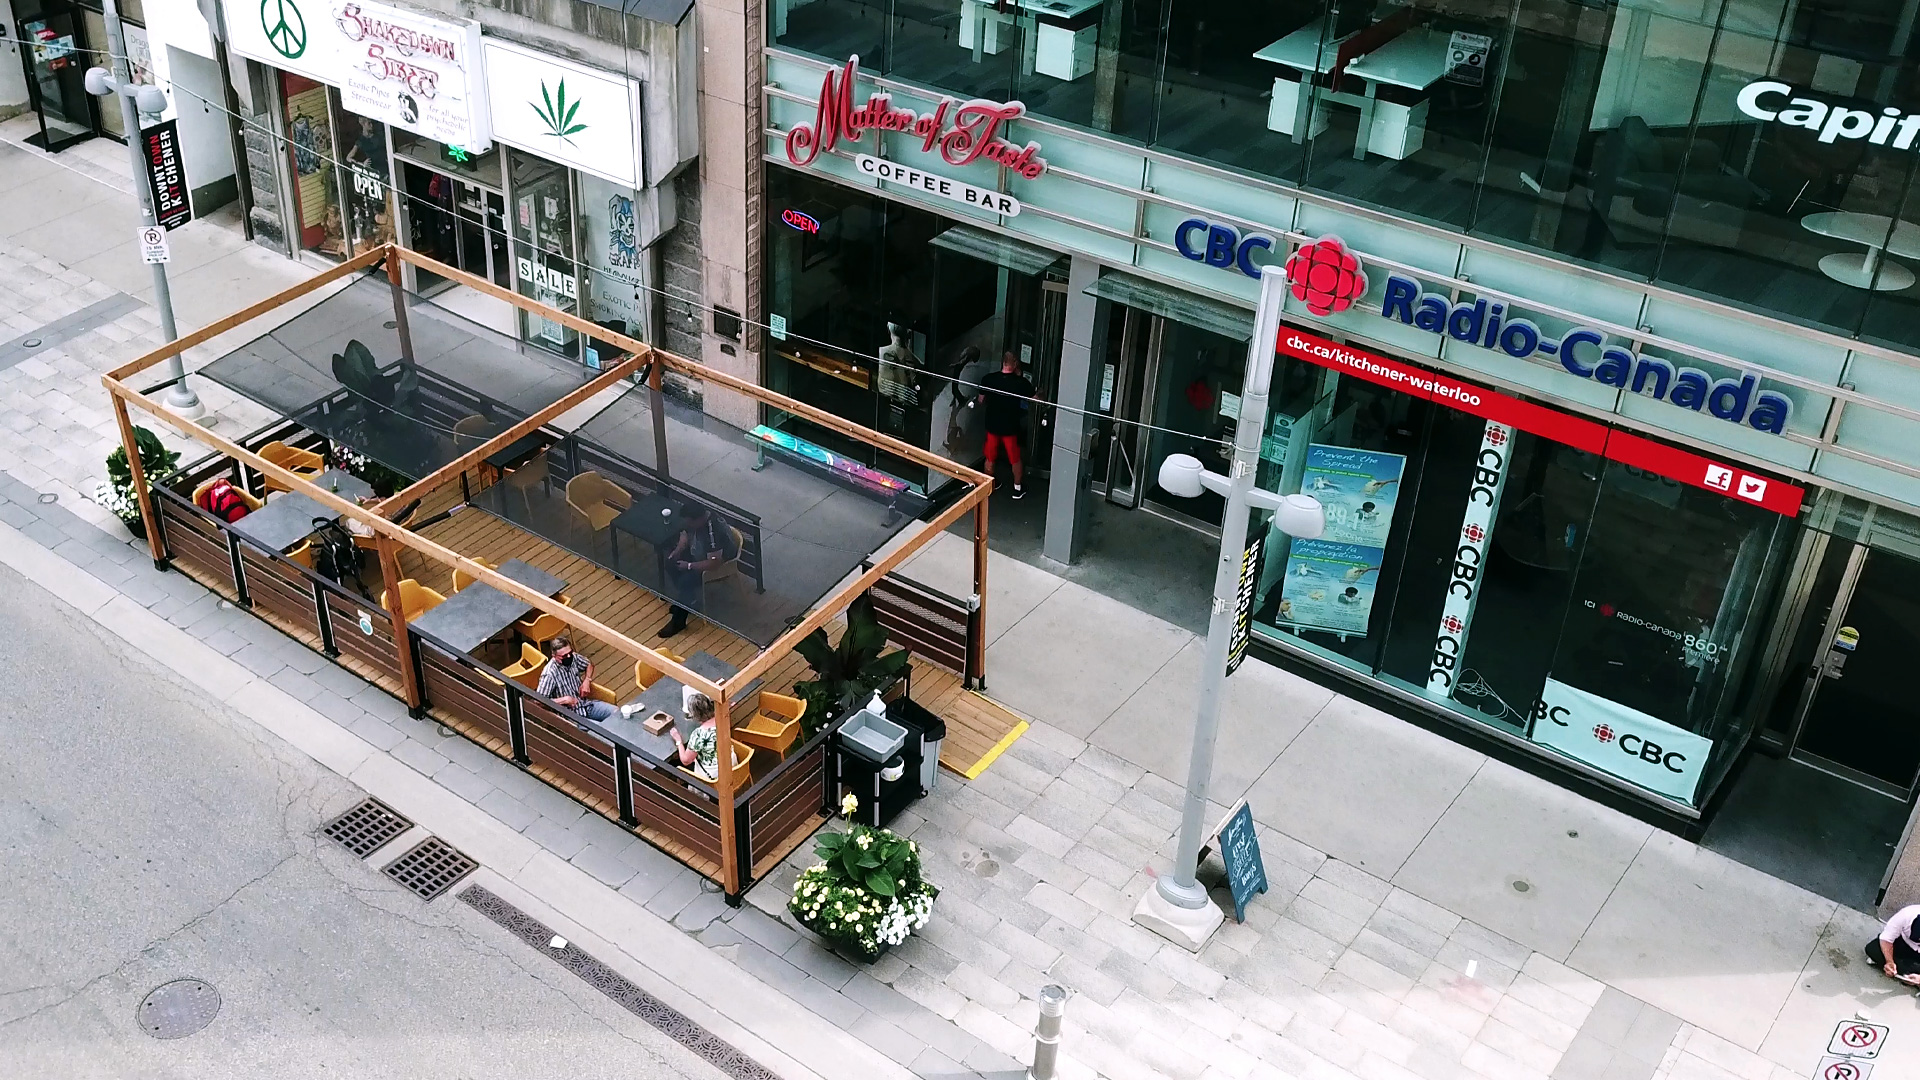 street patio on the sidewalk